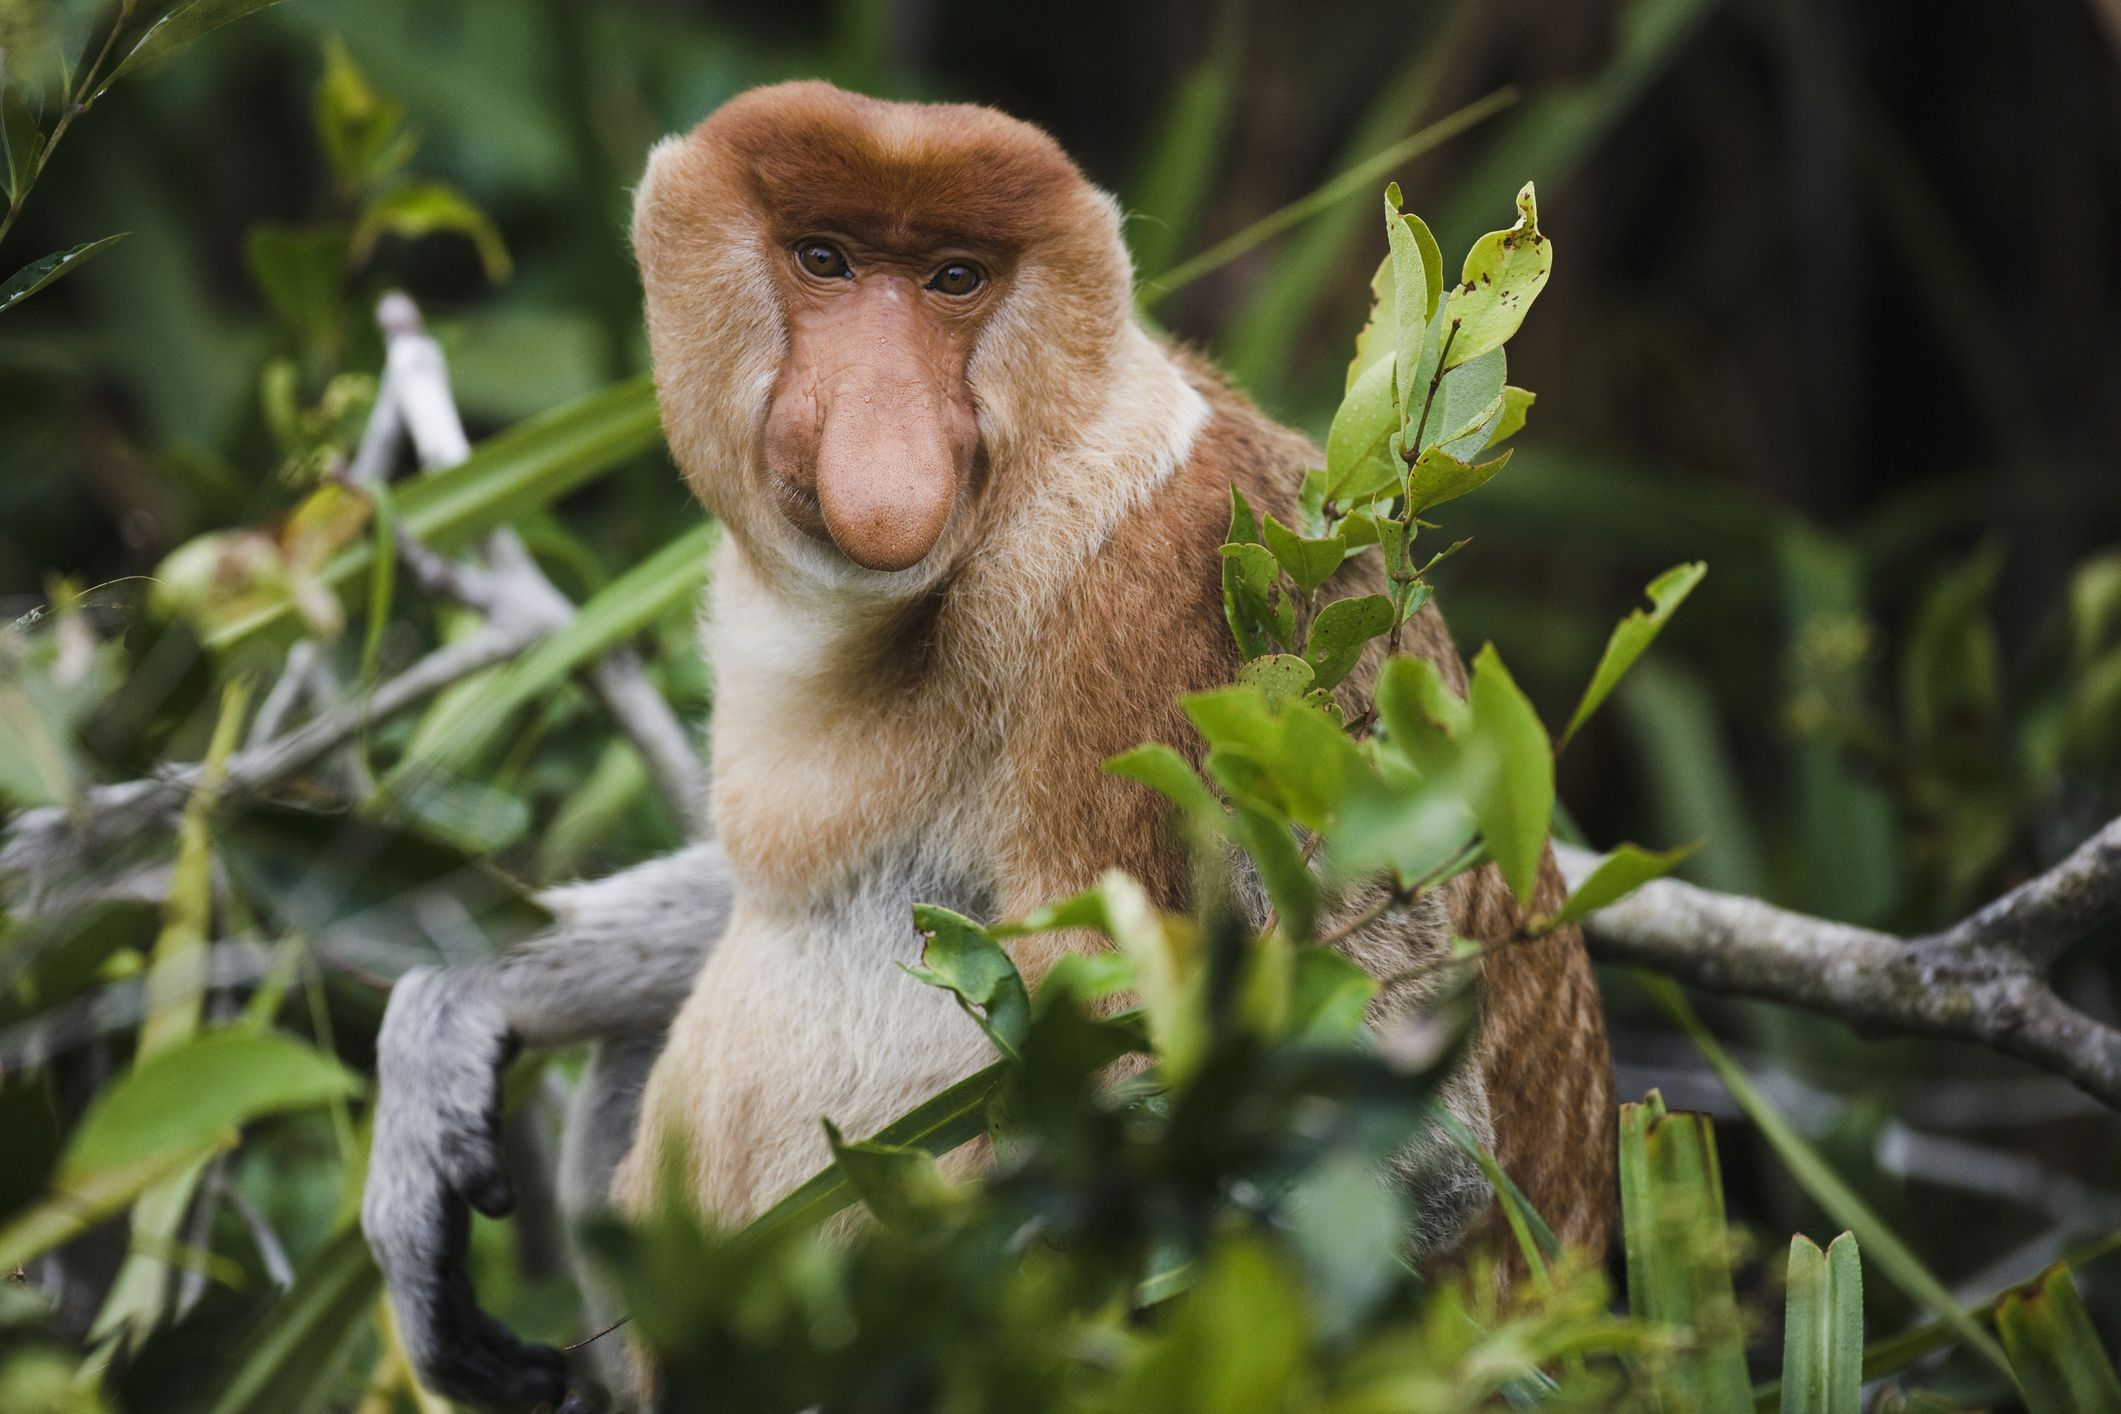 Eye-contact with a proboscis monkey